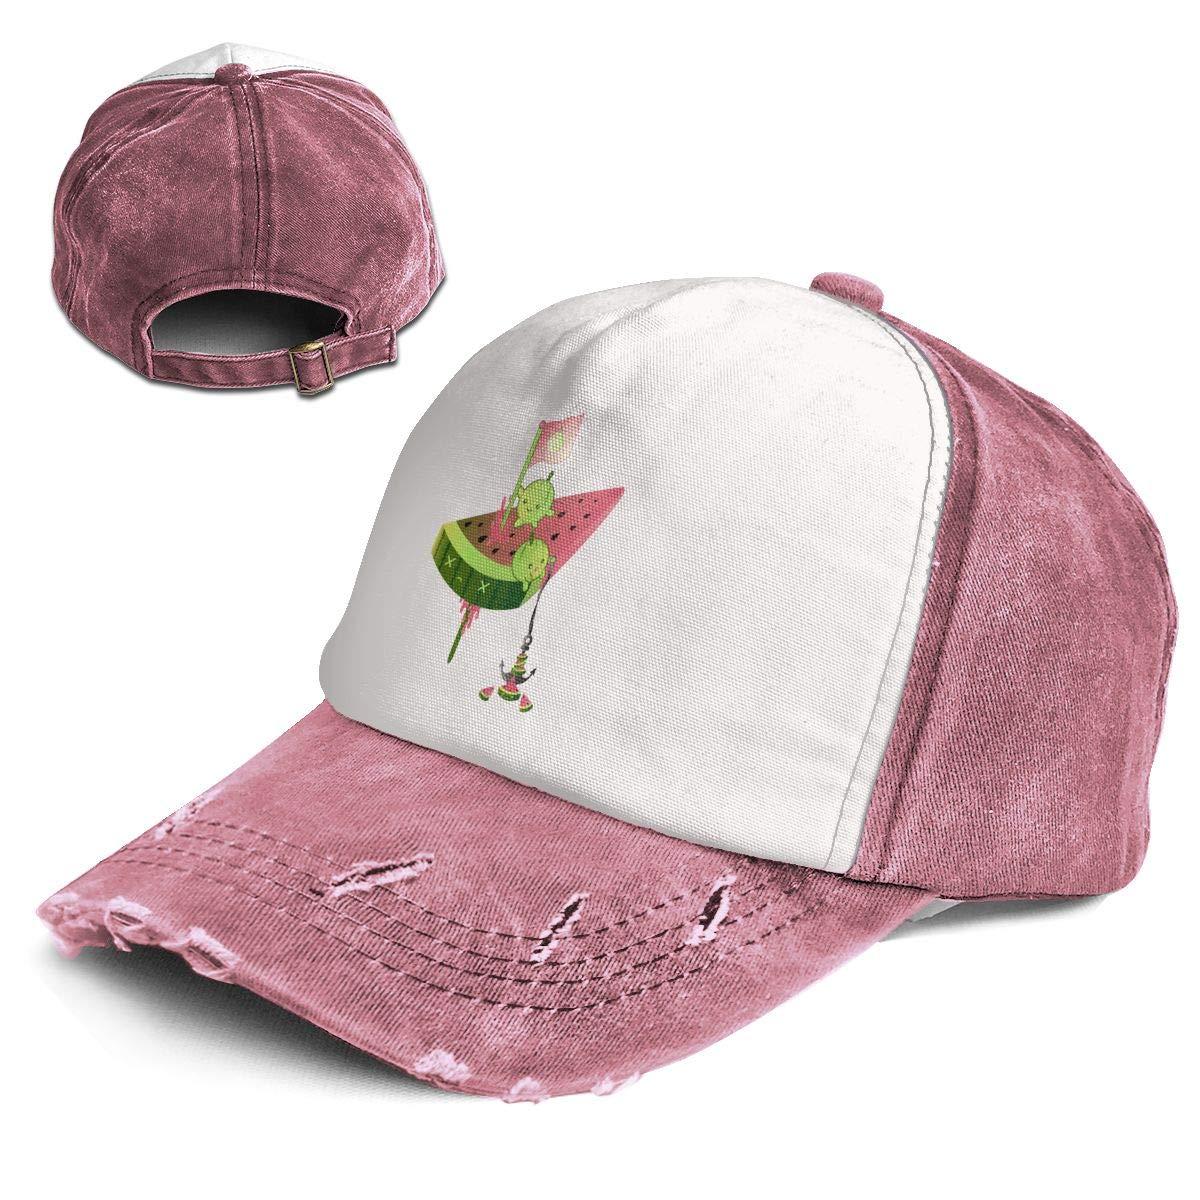 ddc9c685499 RGECXA Unisex Fashion Baseball Cap Melon Vs Watermelon Adjustable Dad Hat  at Amazon Men s Clothing store